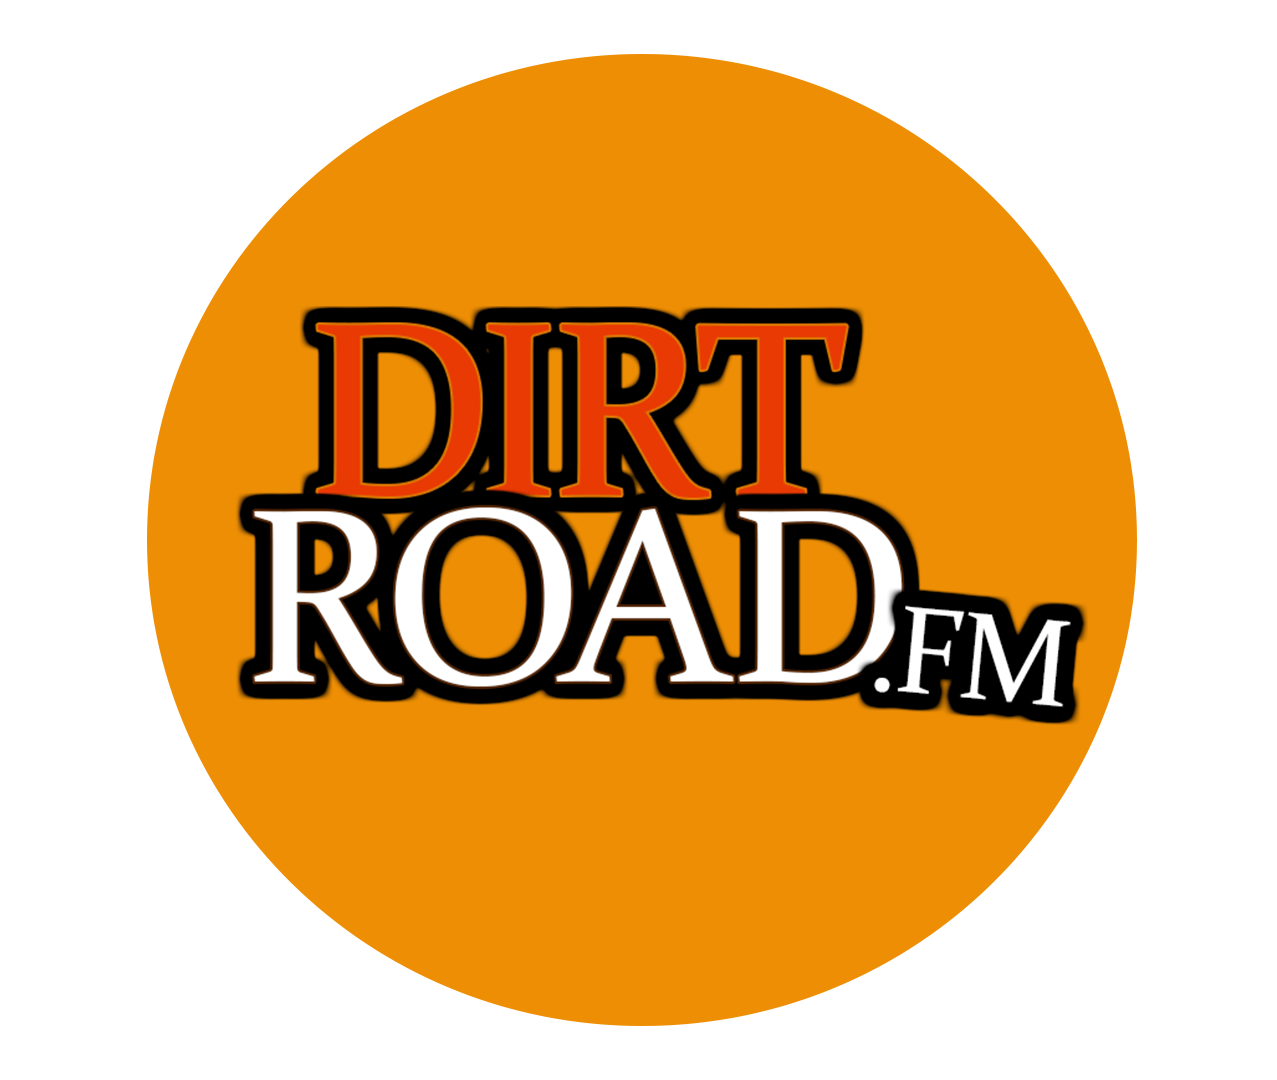 Dirt Road FM logo